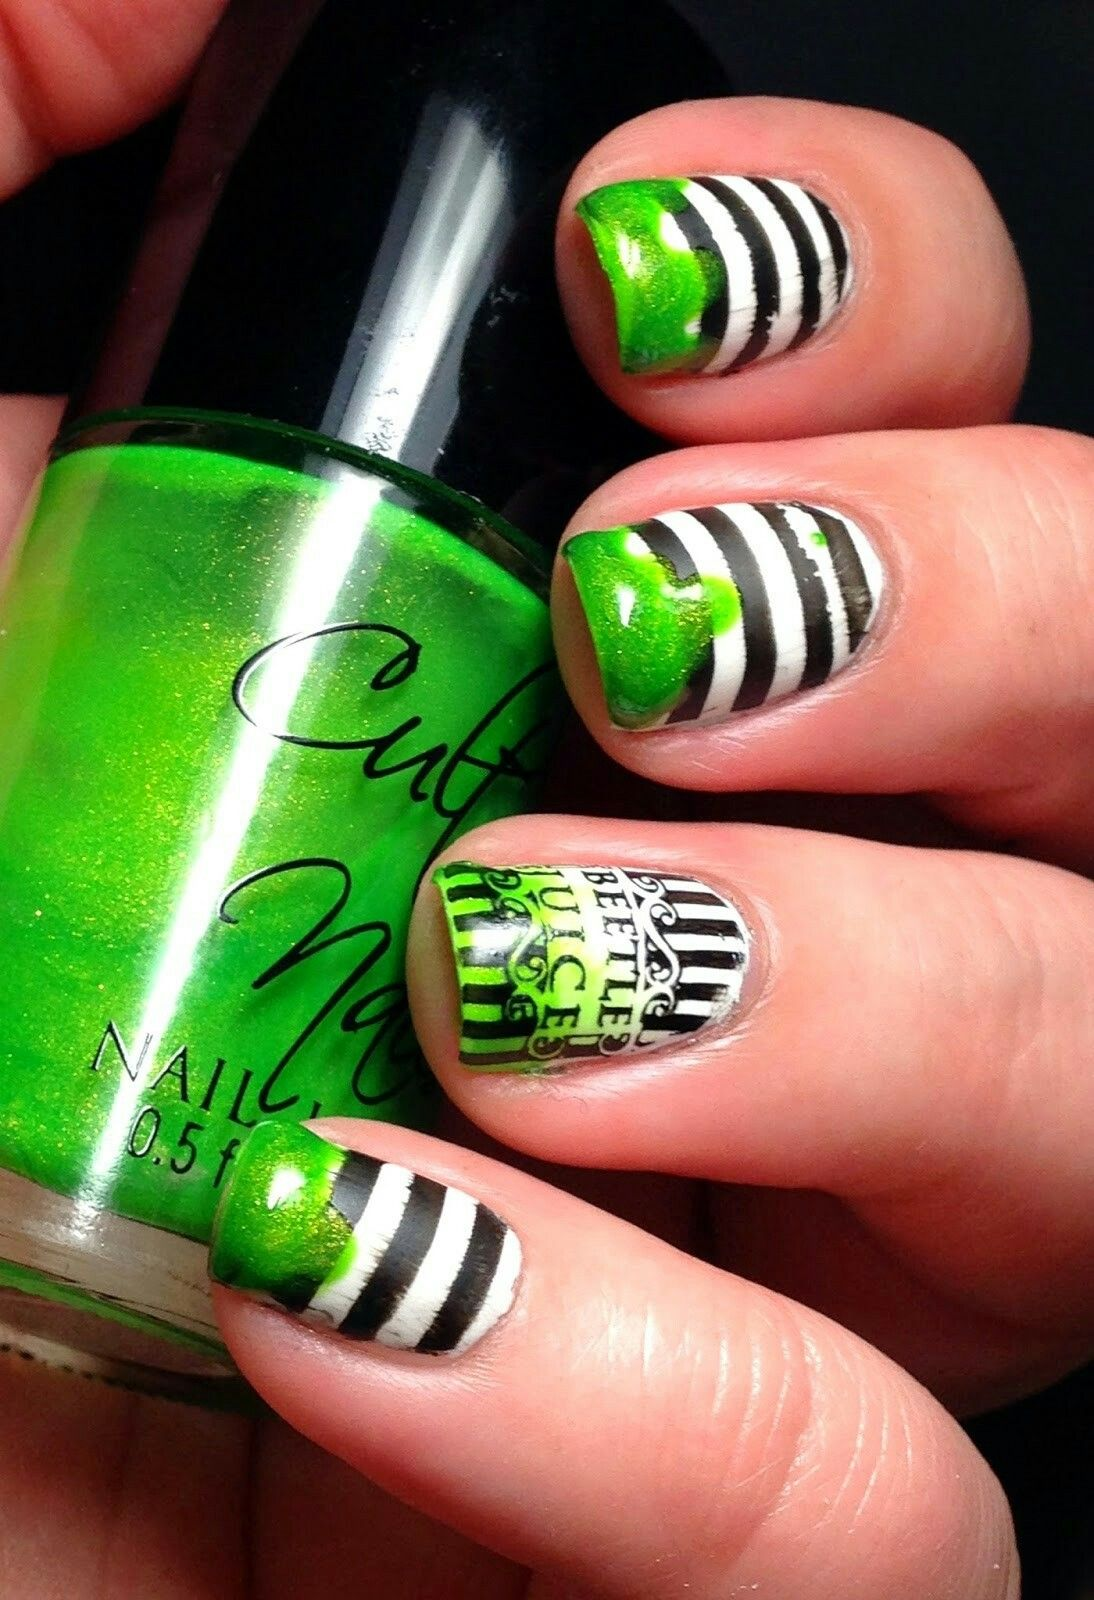 Beetlejuice nails | Halloween nail designs, Scary ...